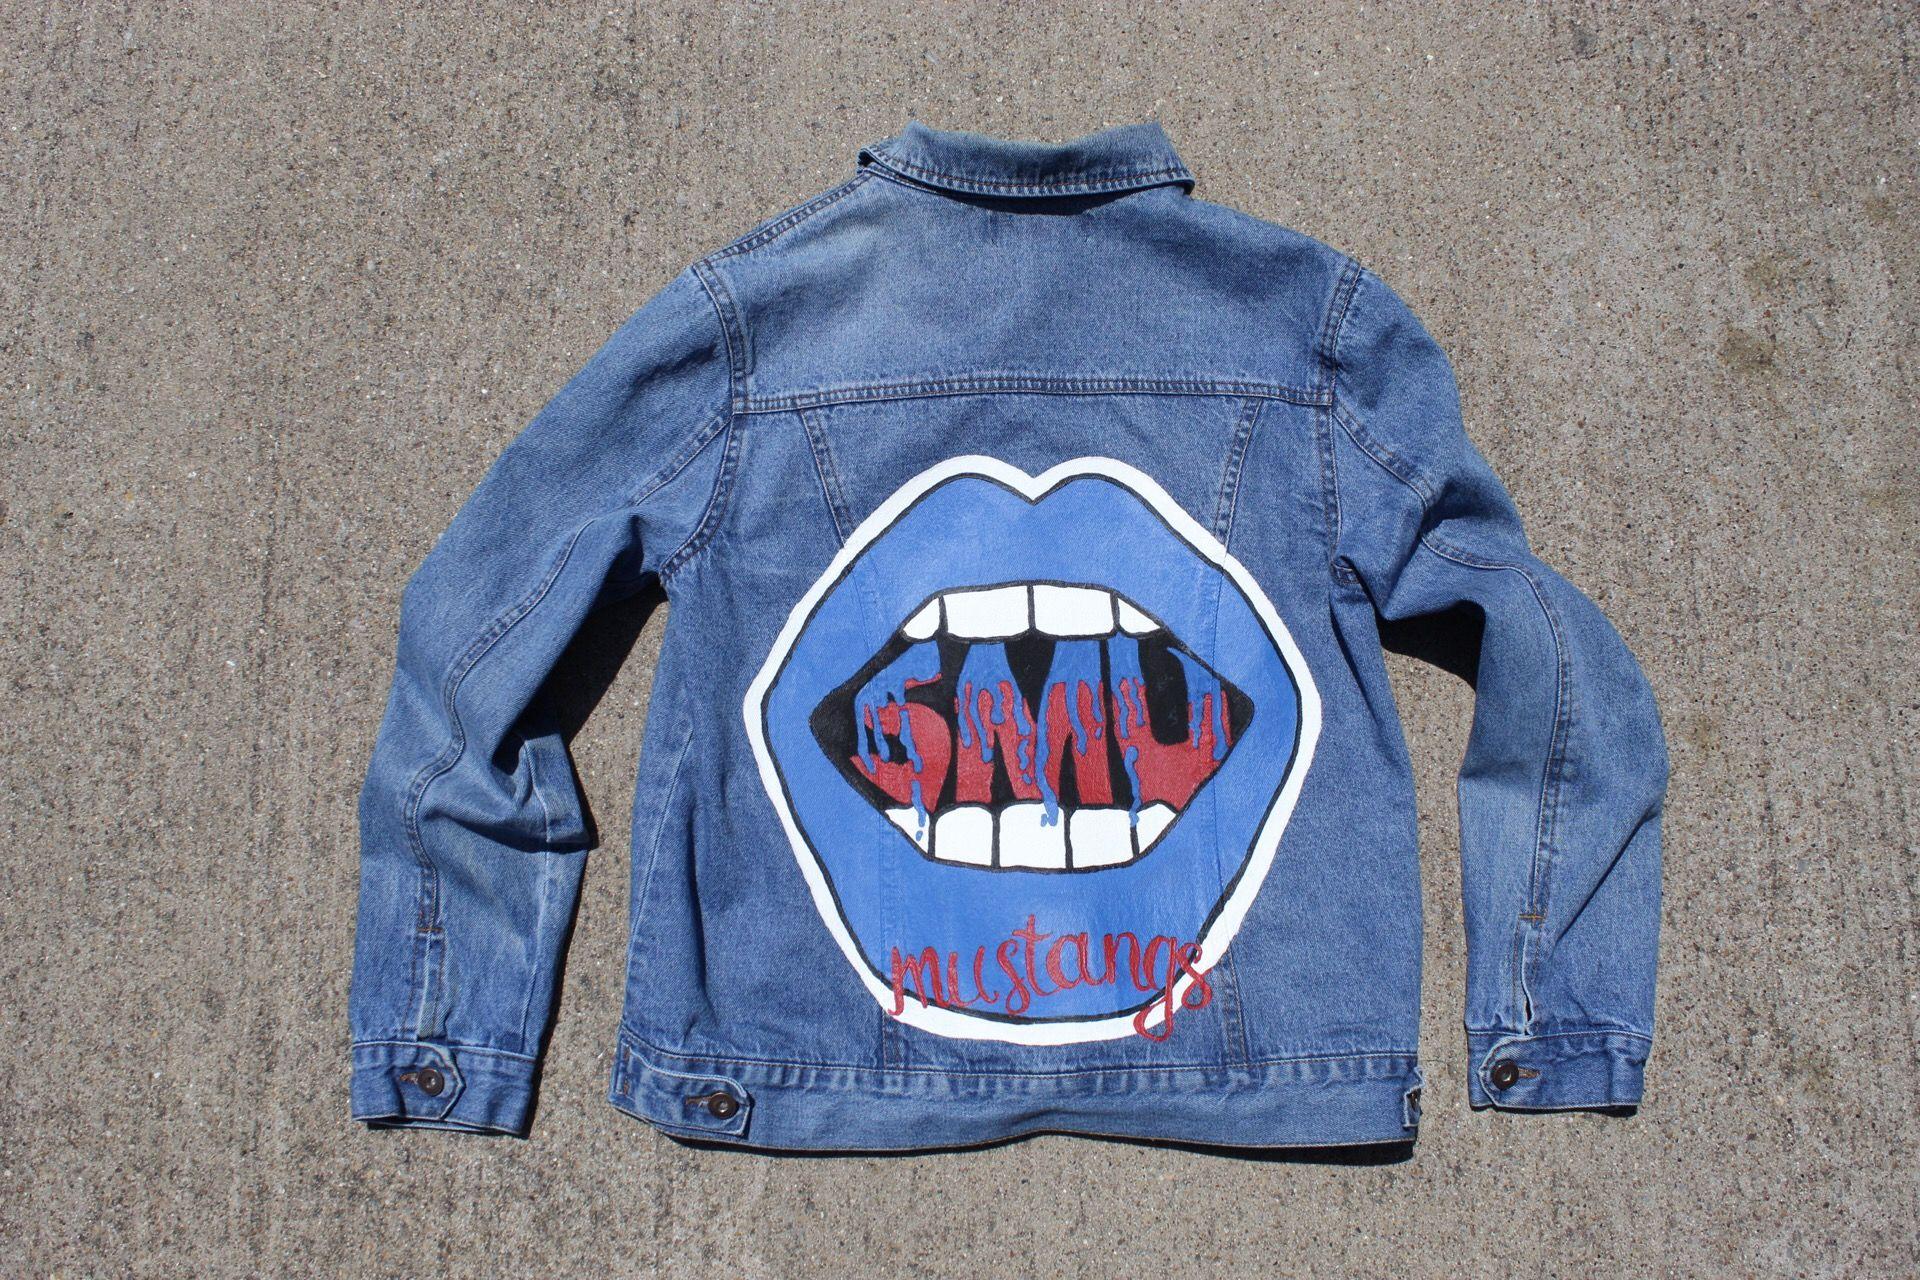 Custom Painted College Denim Jacket Jacket Not Included Etsy Diy Denim Jacket Jackets Denim Jacket [ 1280 x 1920 Pixel ]